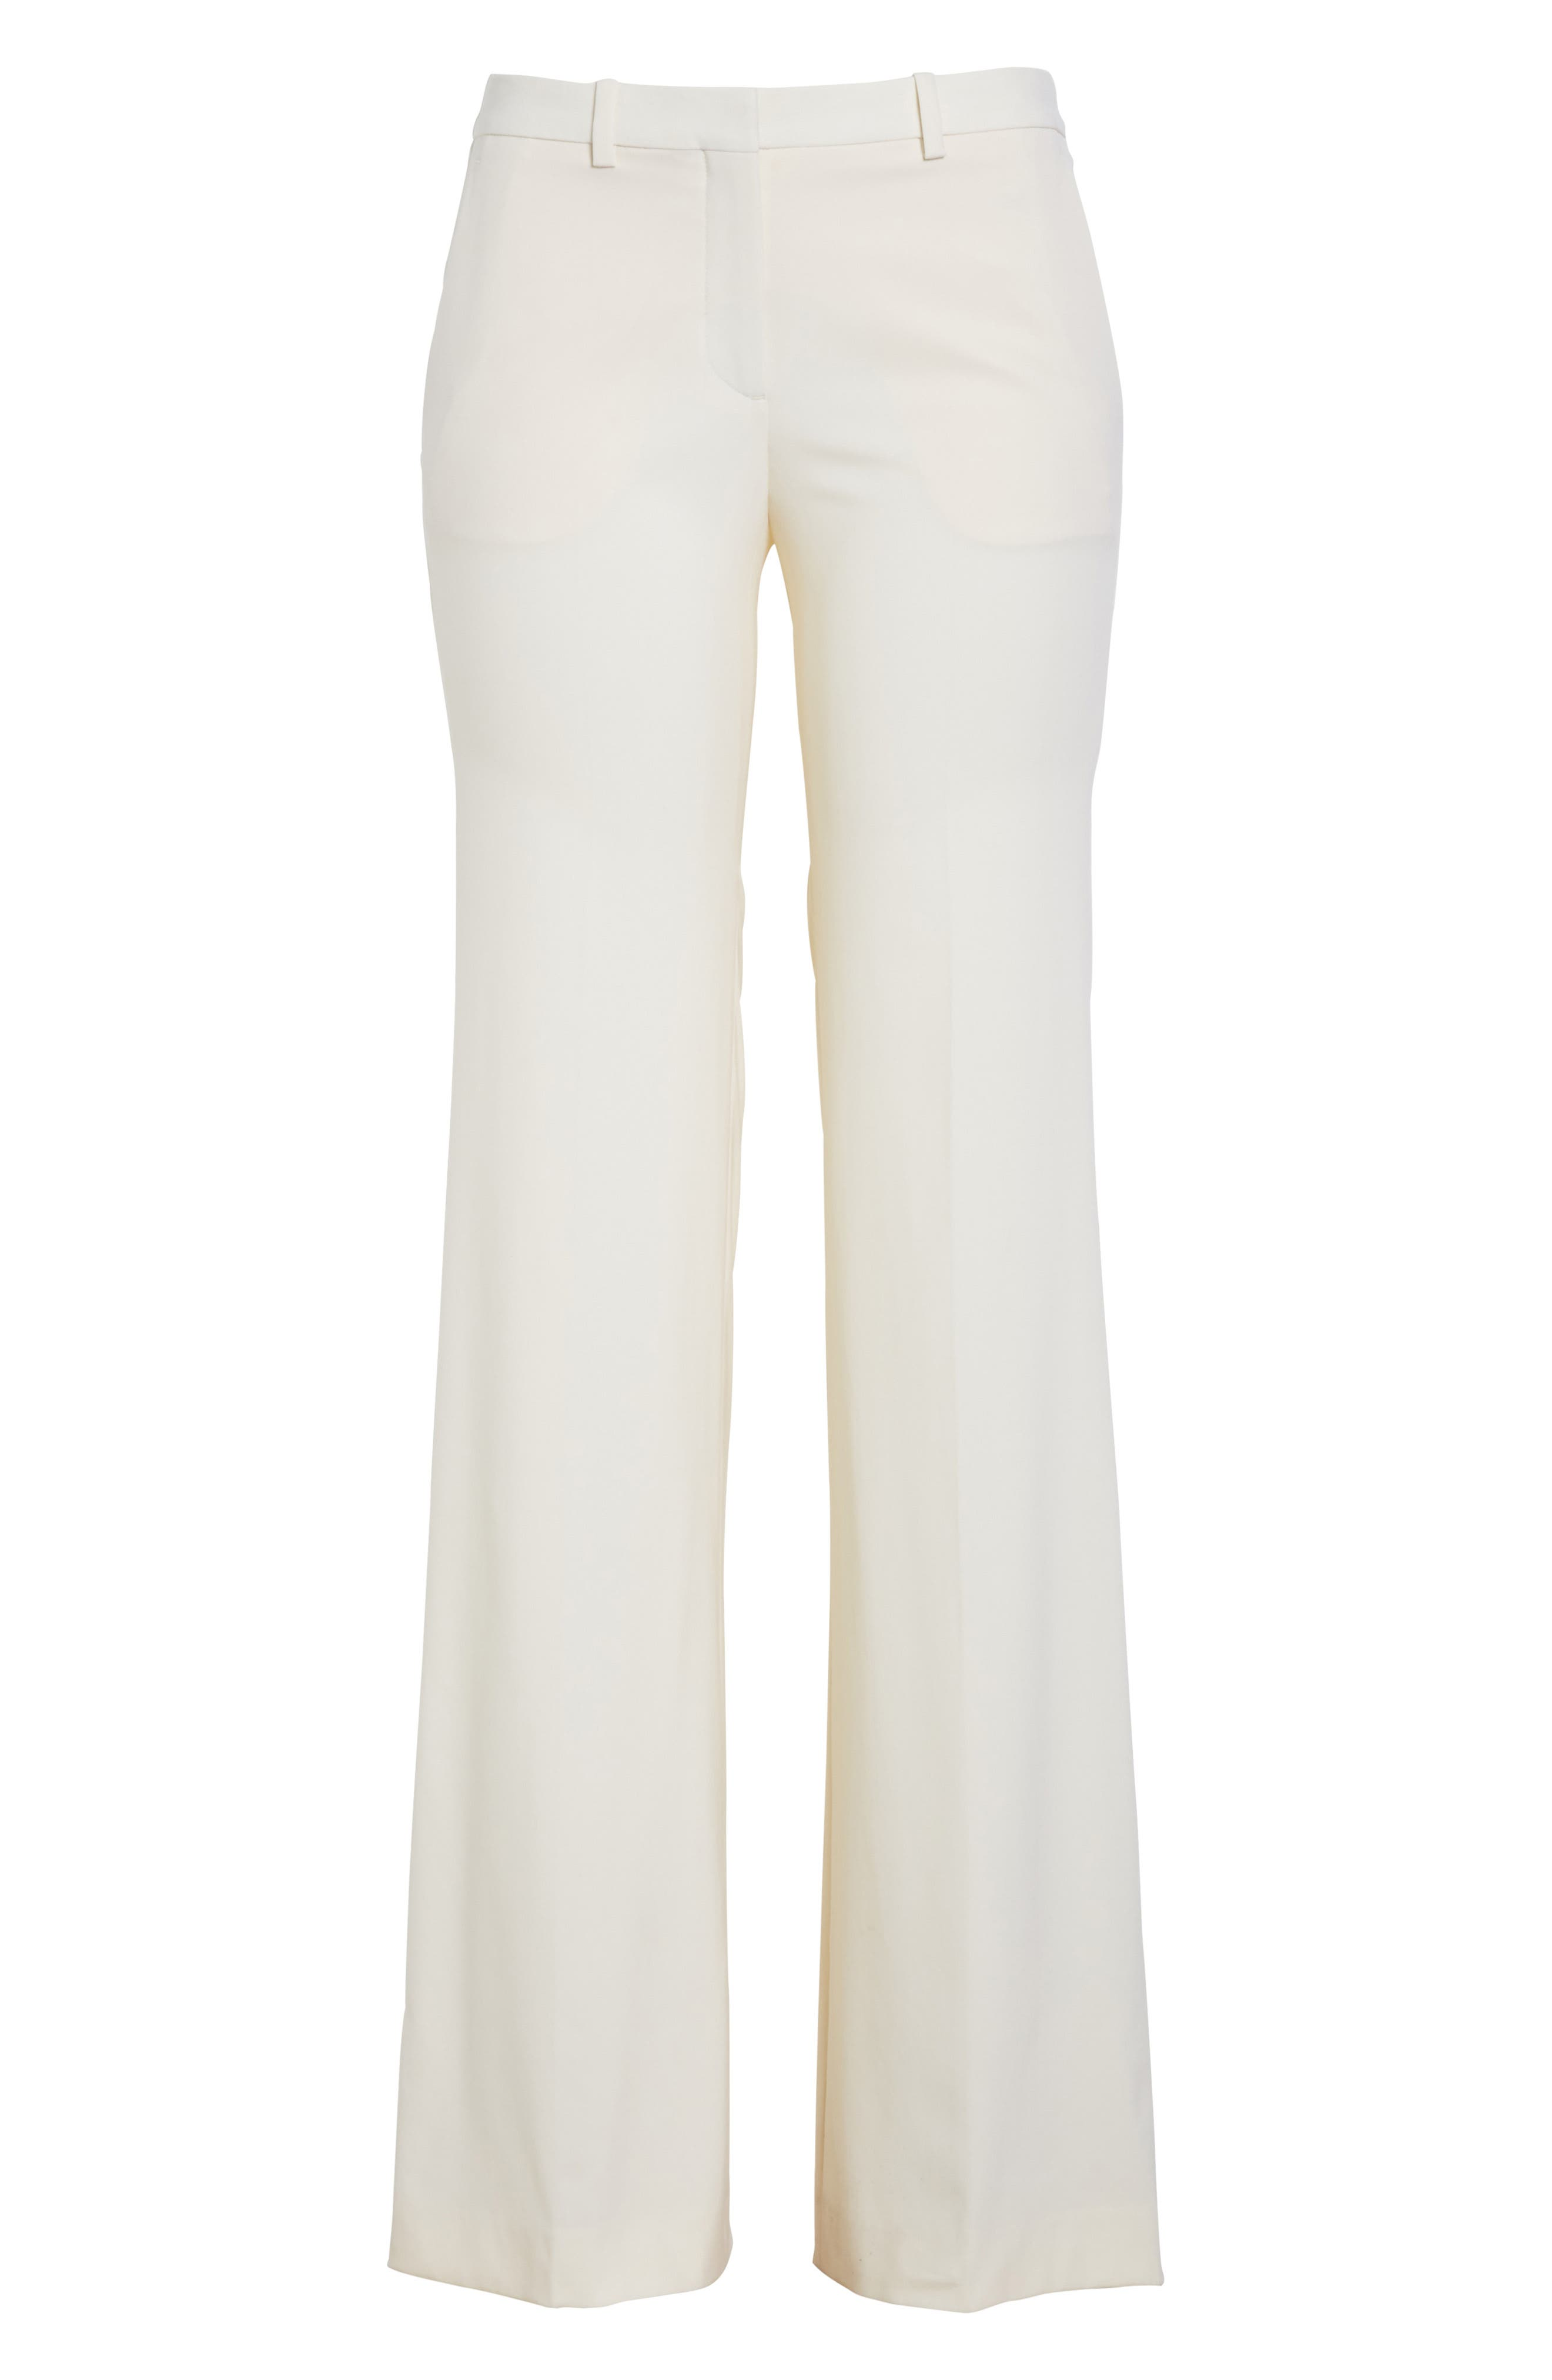 Demitria Polished Wool Pants,                             Alternate thumbnail 6, color,                             White